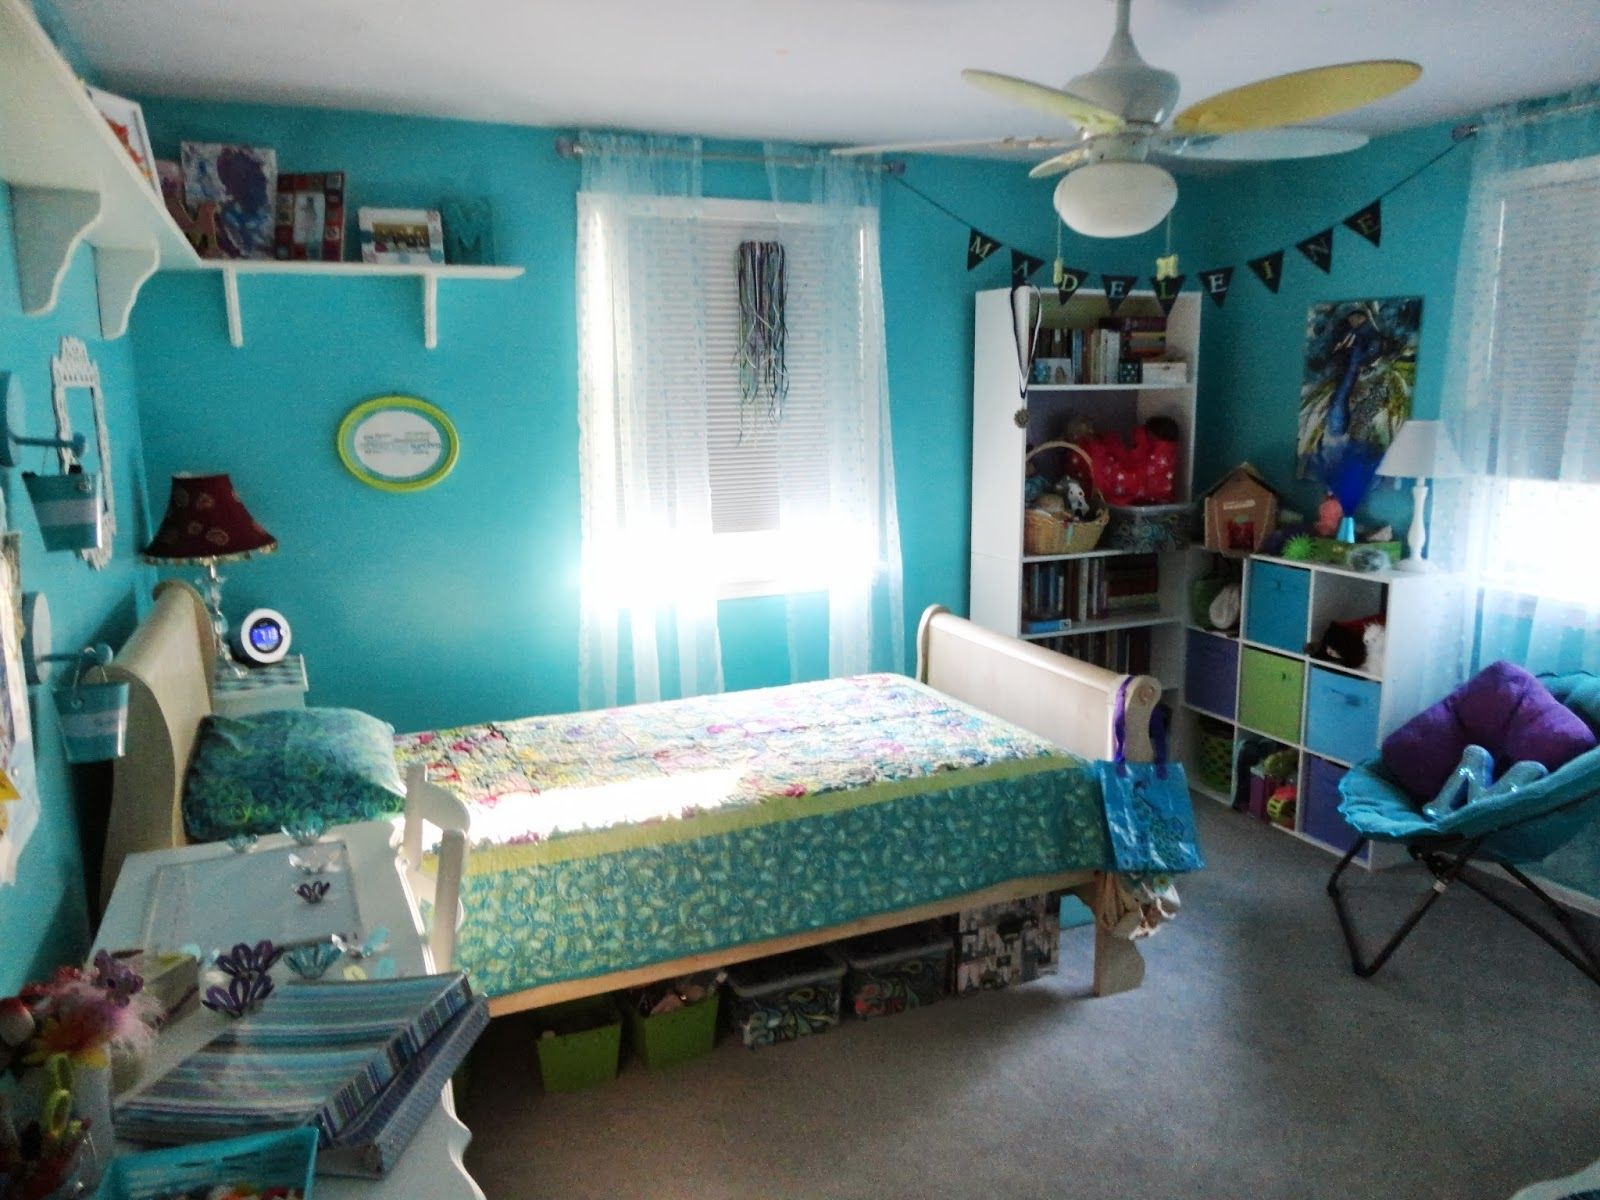 Entzuckend Bedroom : Bedroom Ideas For Young Adults Women Tumblr Mudroom Hall  Victorian Medium